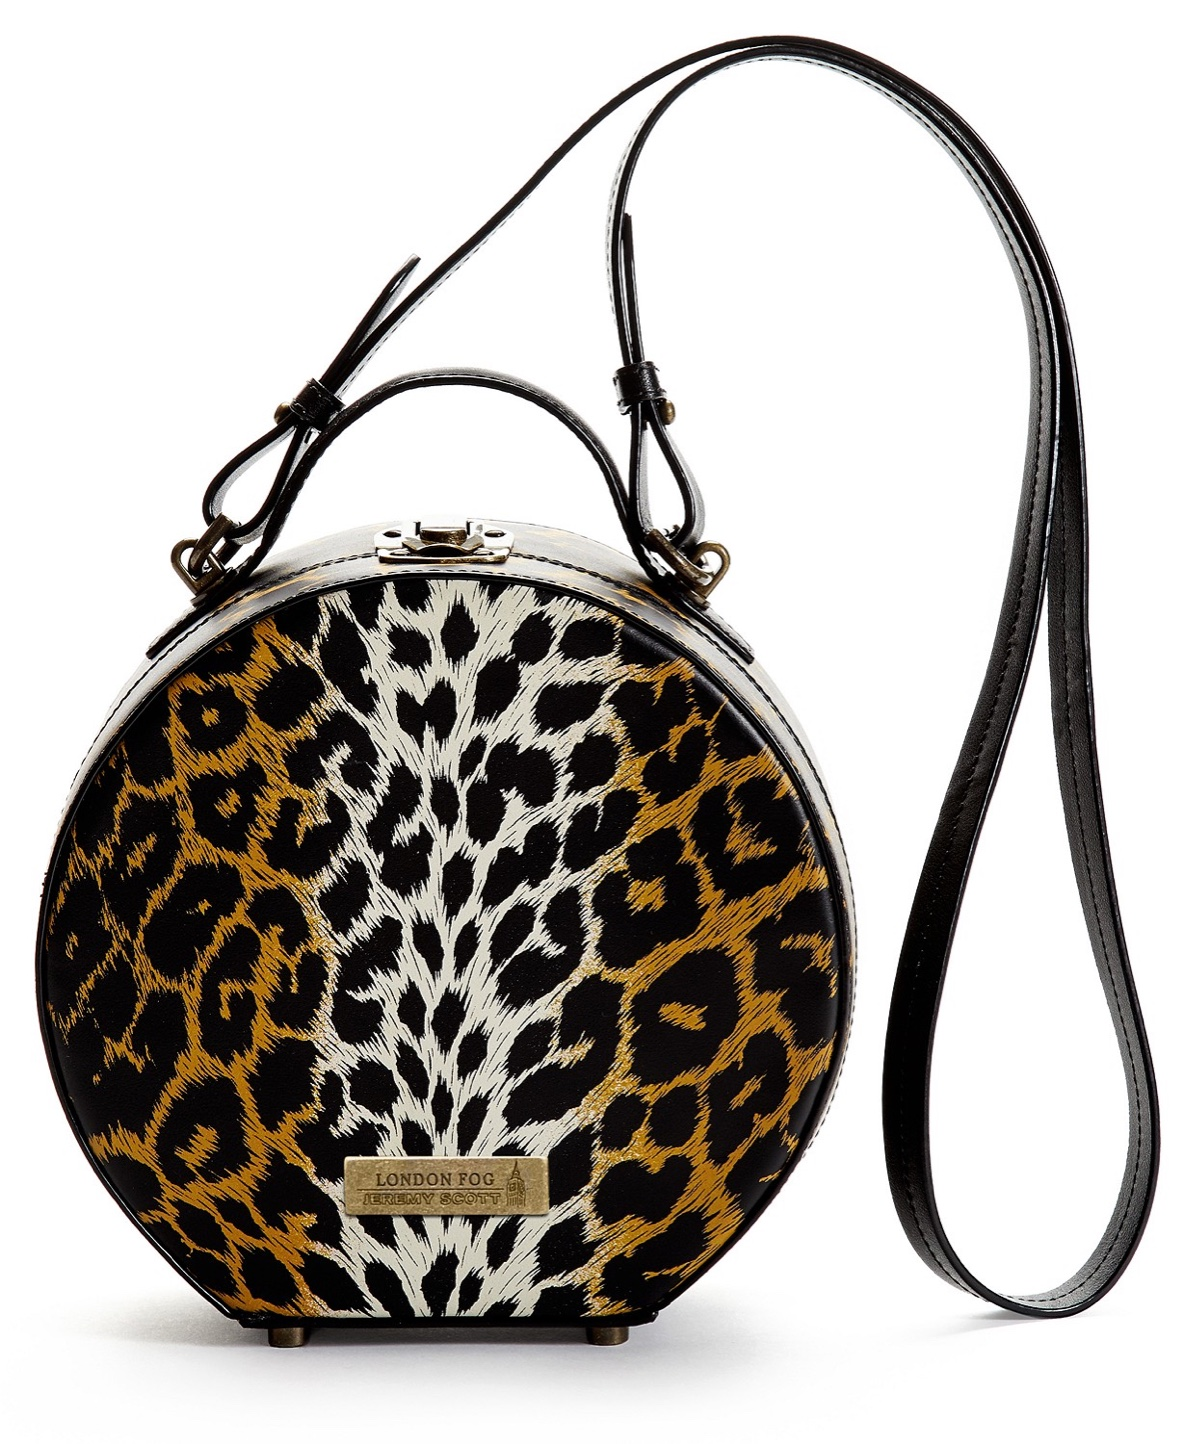 London Fog x Jeremy Scott Leather Hat Box Handbag $225